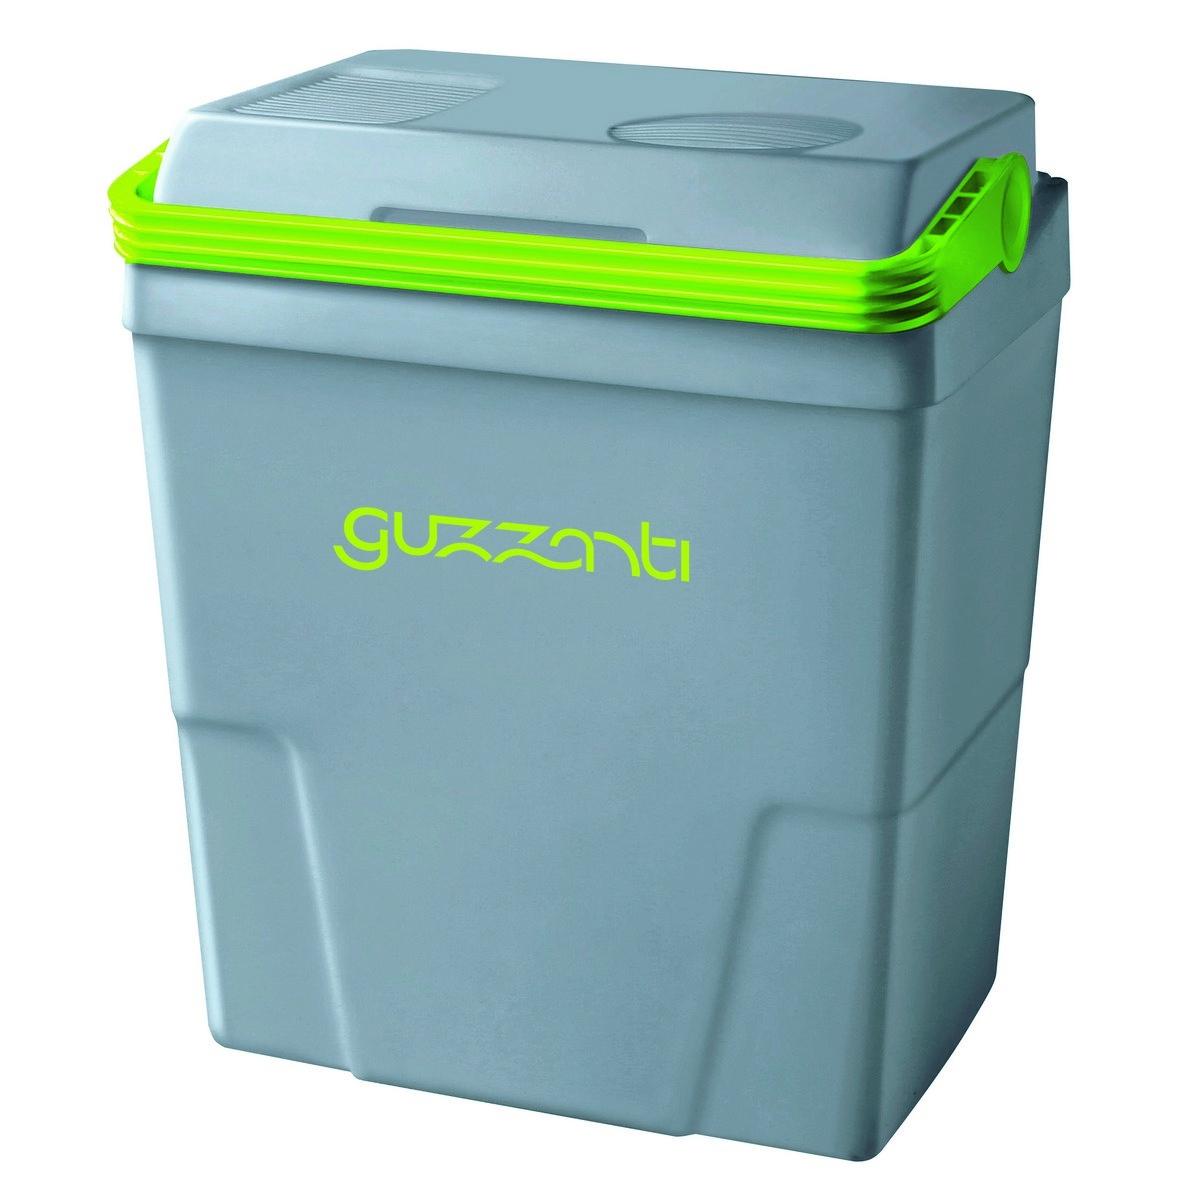 Guzzanti GZ 22B termoelektrický chladiaci box